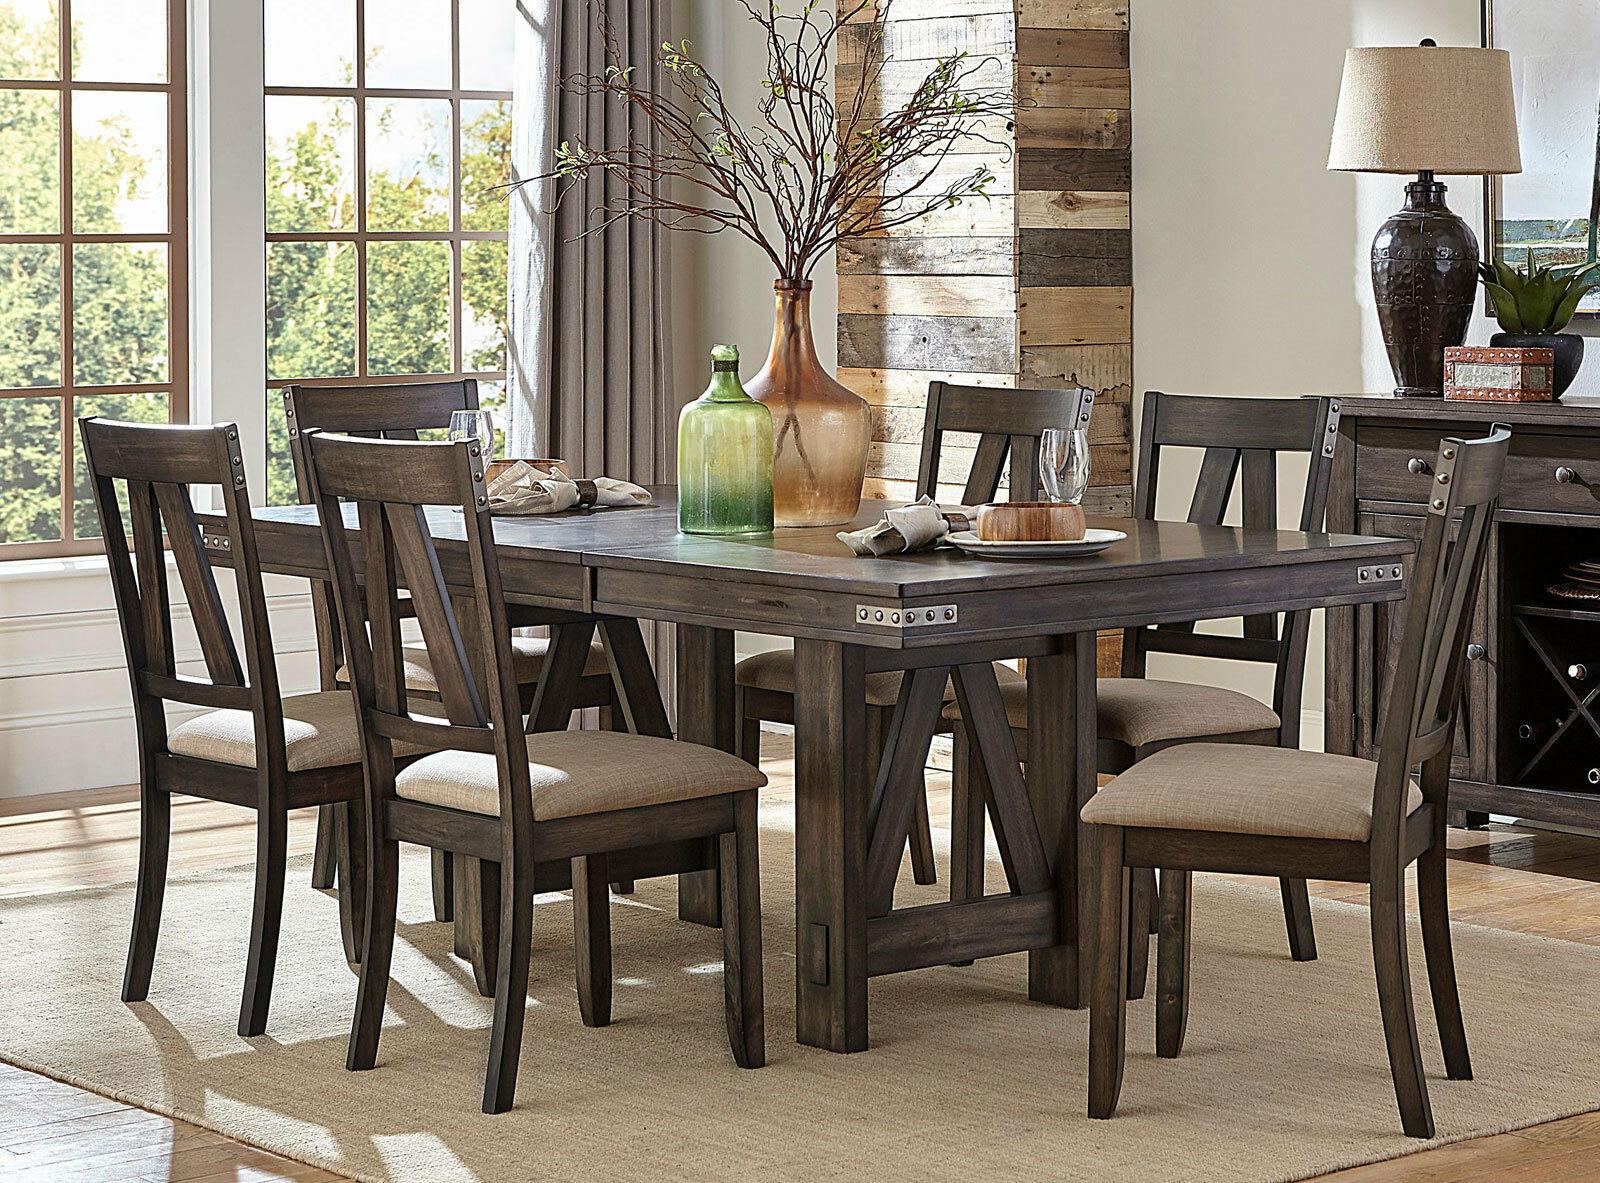 Trent Austin Design Alegre Extendable Dining Table ...